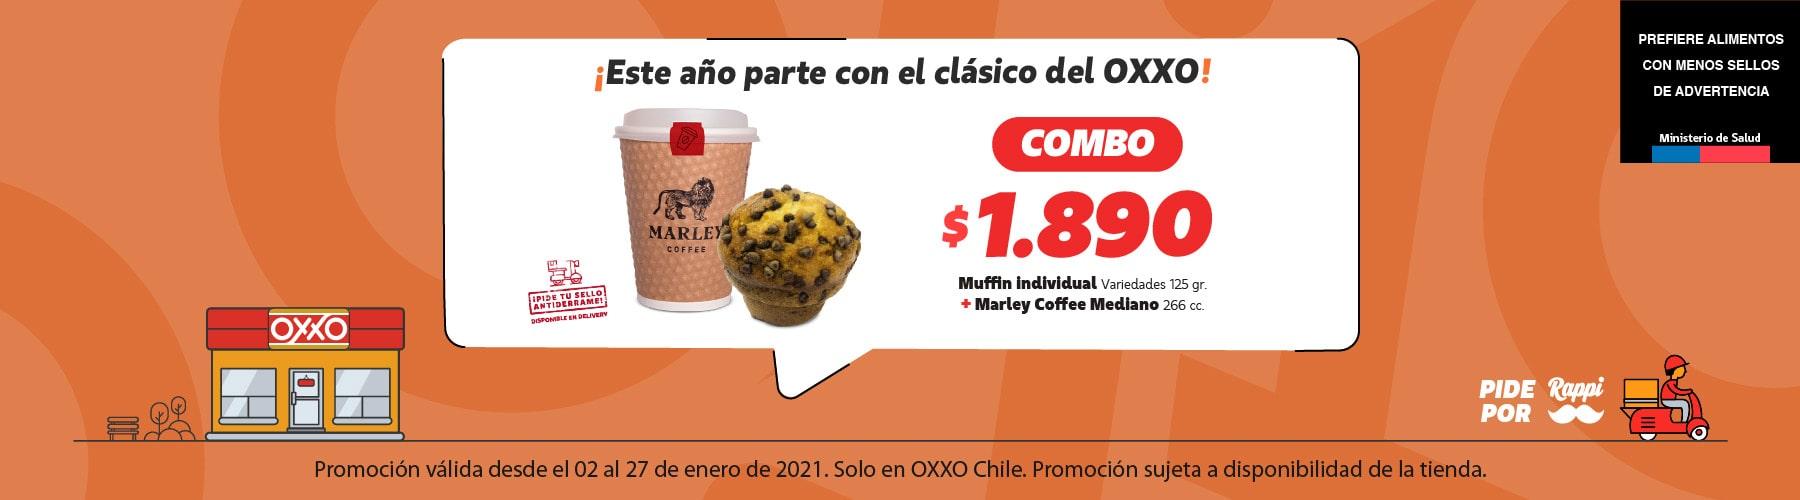 OXXO Chile Banner Marley Enero 2021